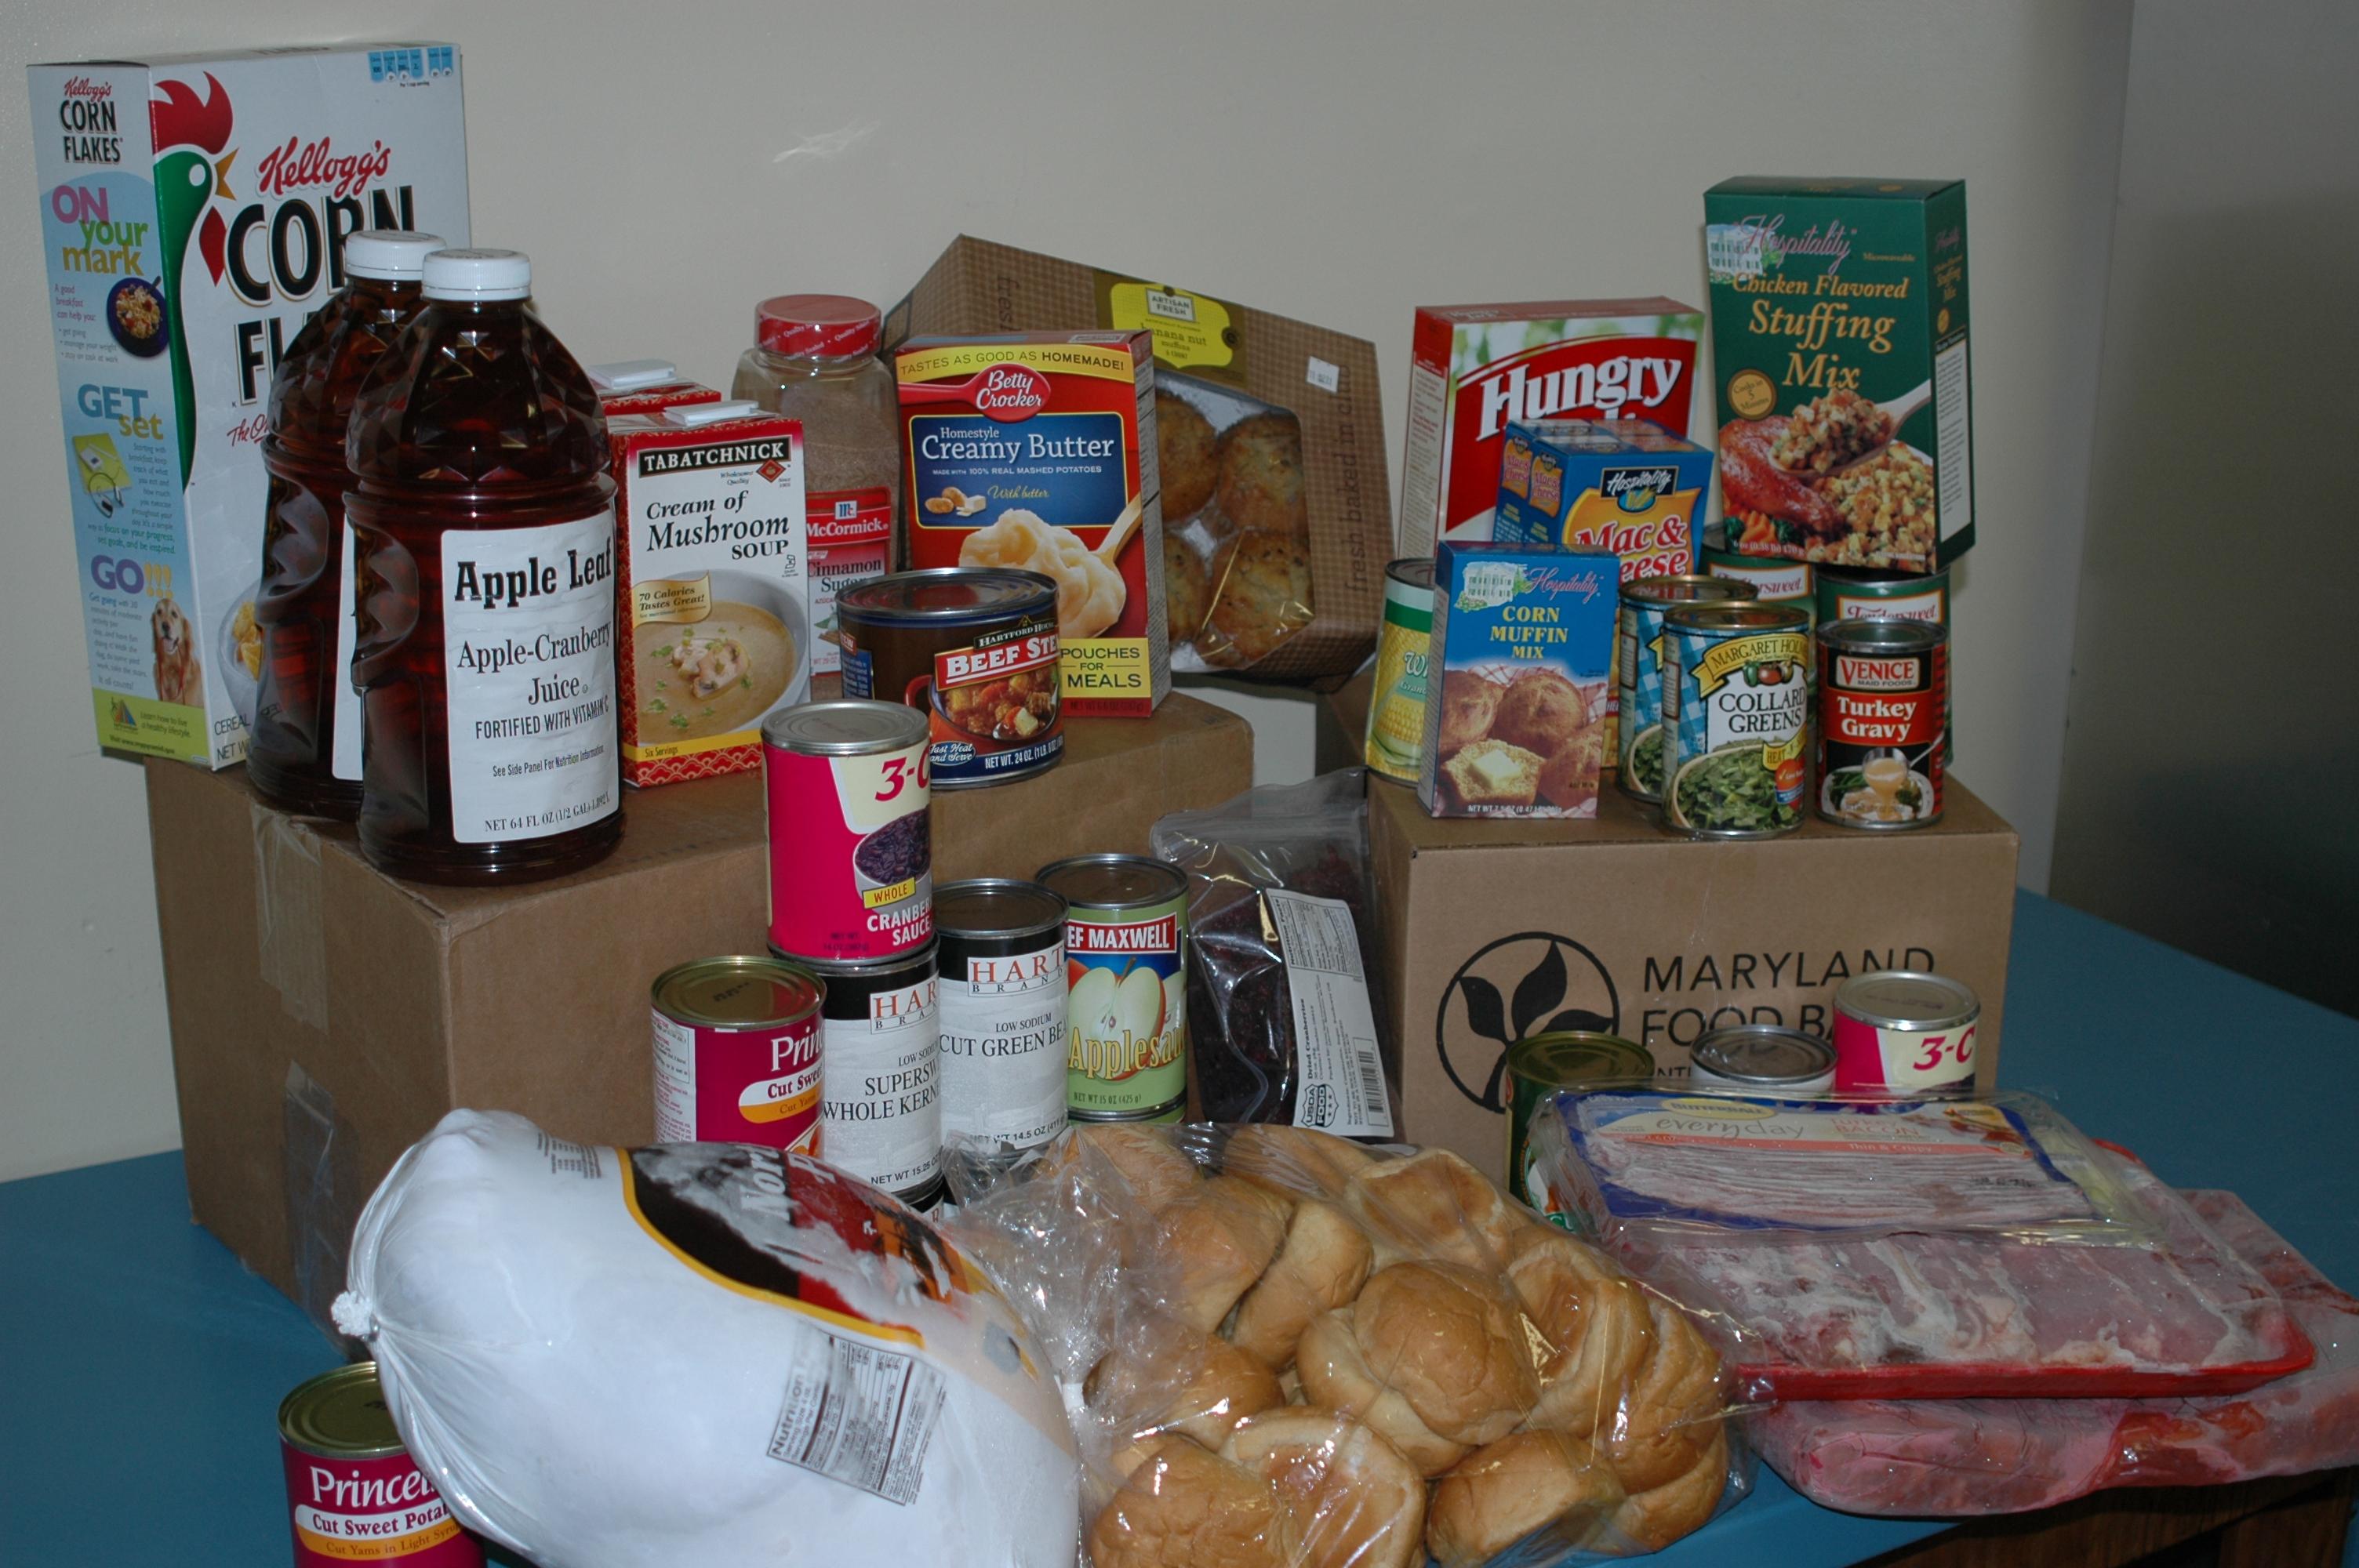 Nov 11 food pkg 007